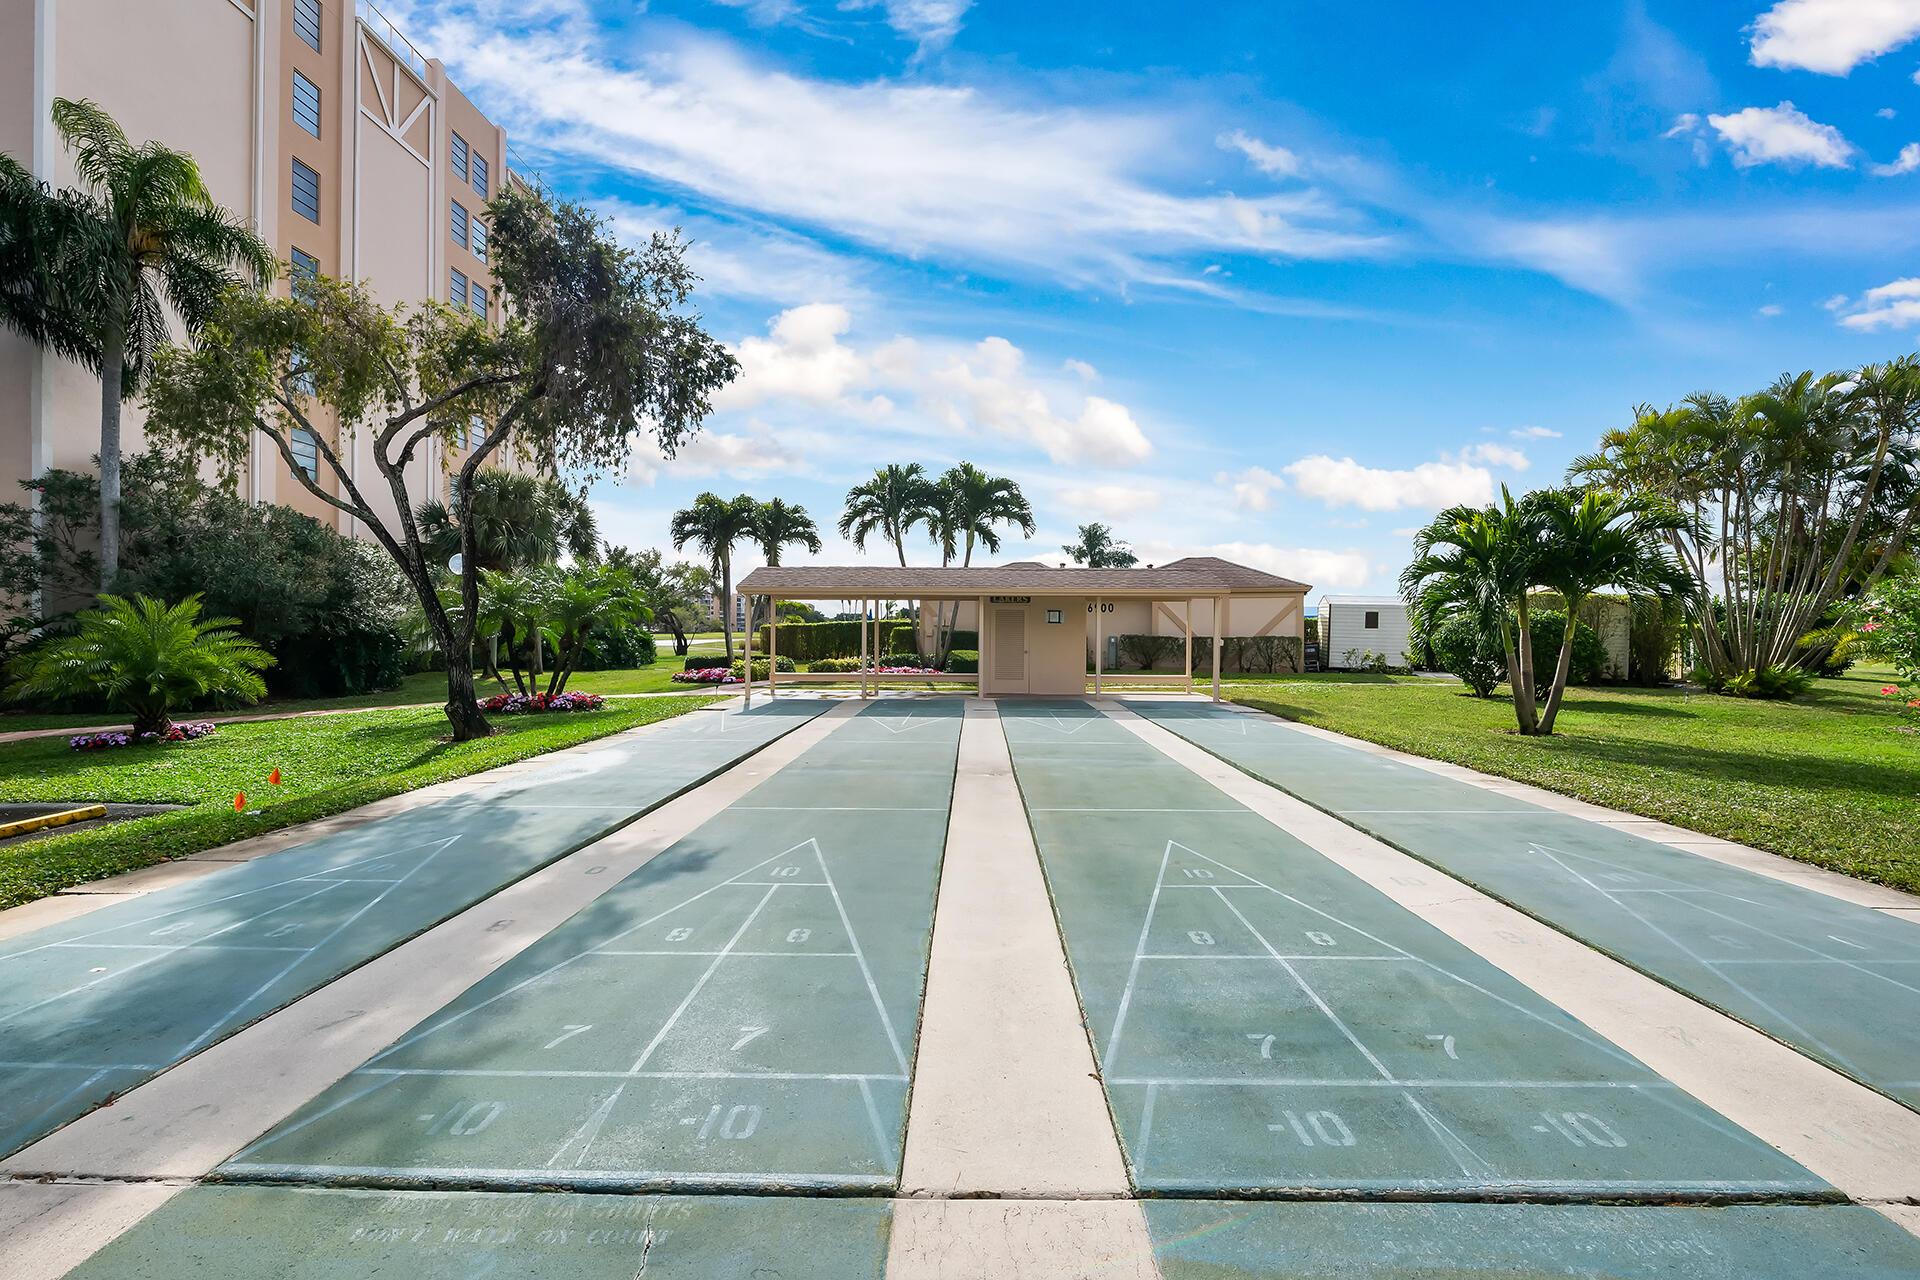 14307 Bedford Drive, Delray Beach, Florida 33446, 2 Bedrooms Bedrooms, ,2 BathroomsBathrooms,Residential,For Sale,Bedford,RX-10694559